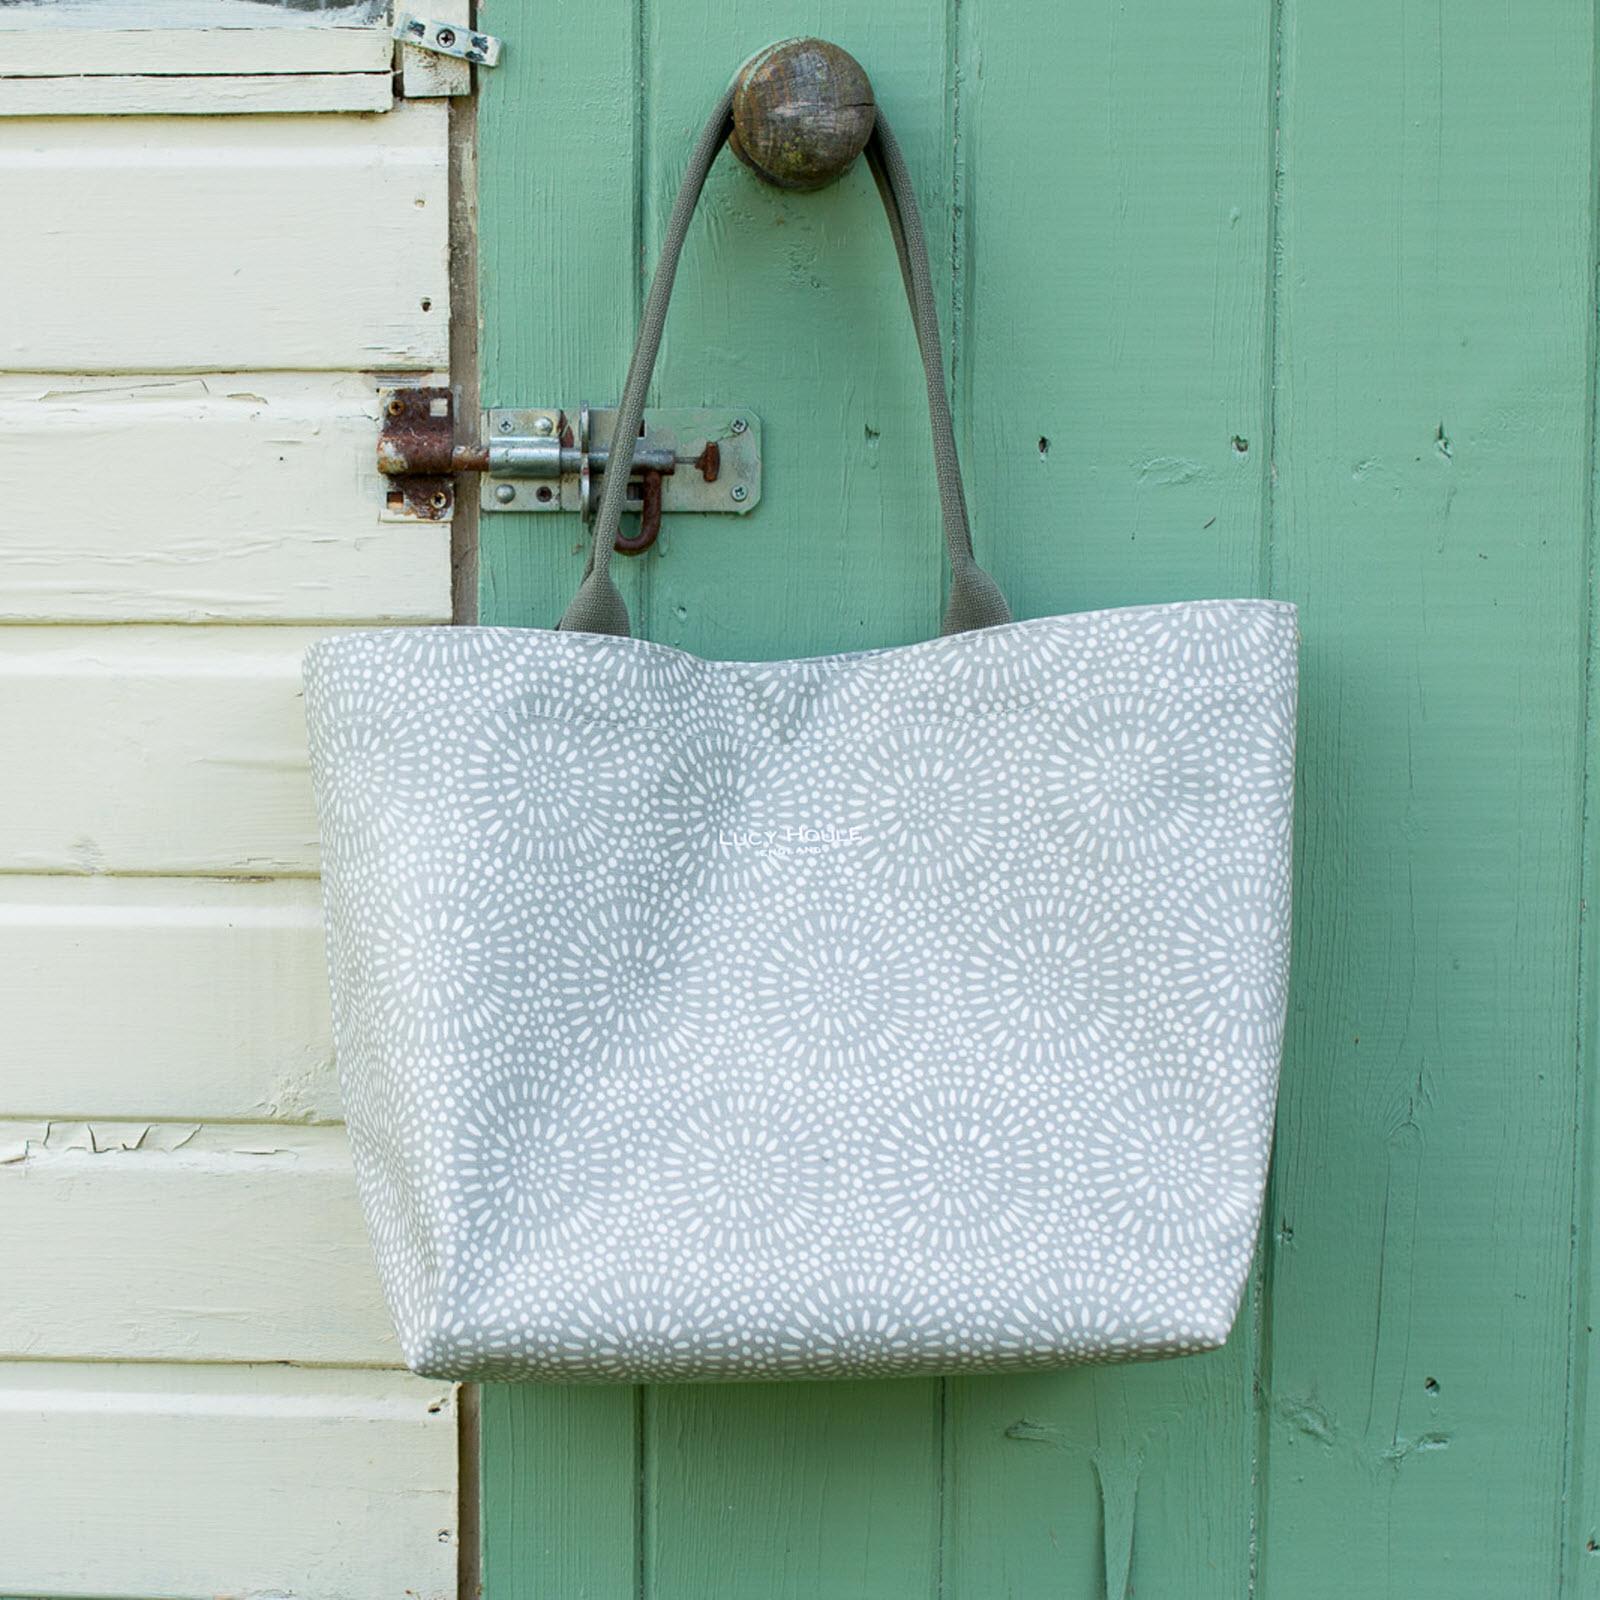 Stone Sunburst Medium Tote Bag with Khaki Handles